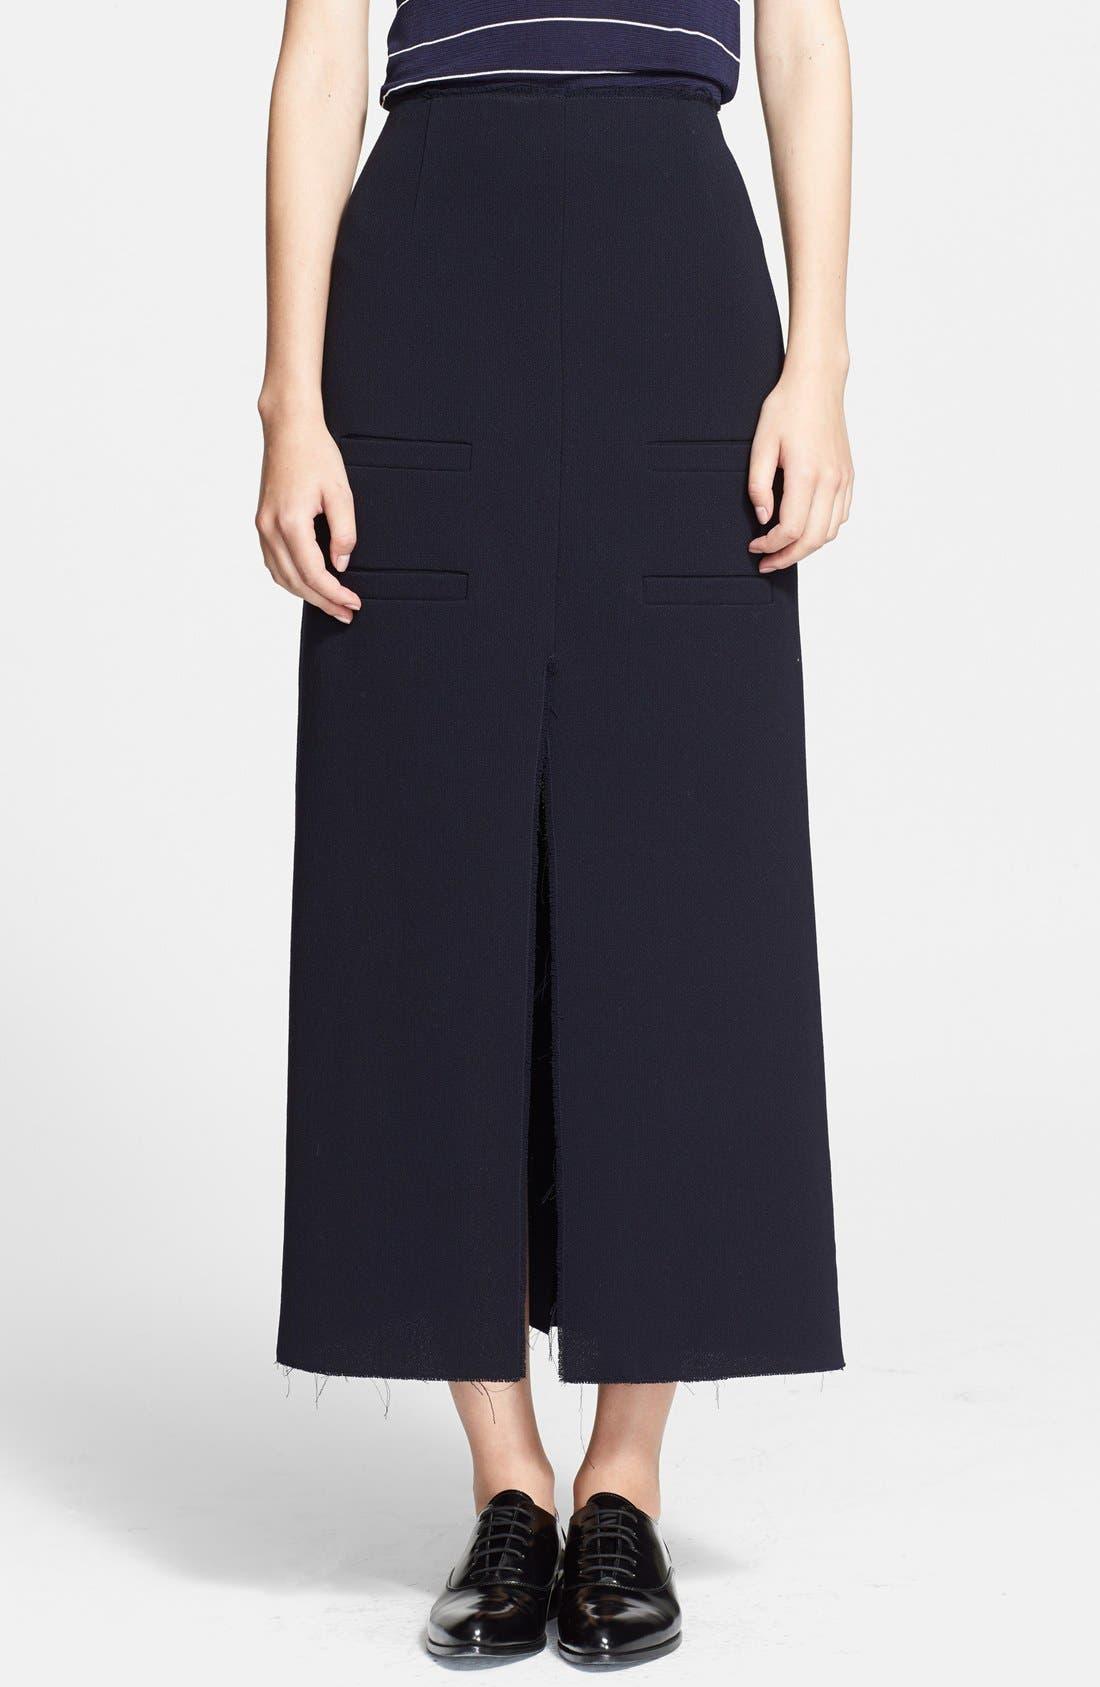 Main Image - J.W.ANDERSON Stretch Crepe Midi Skirt